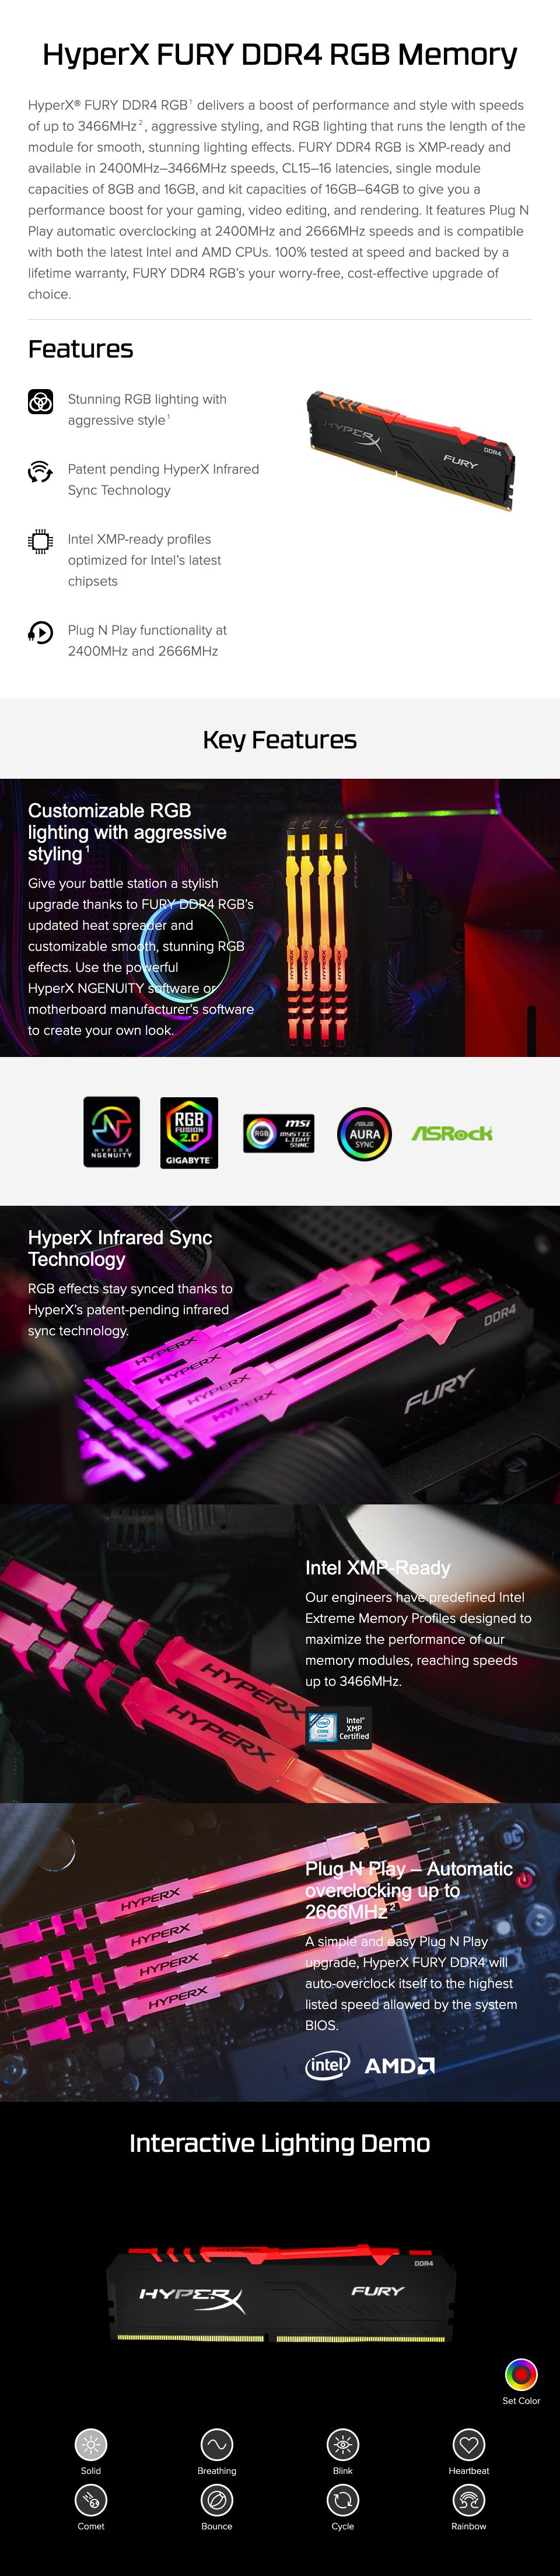 זכרון Kingston HyperX Fury RGB 8GB 3000MHz CL15 DDR4